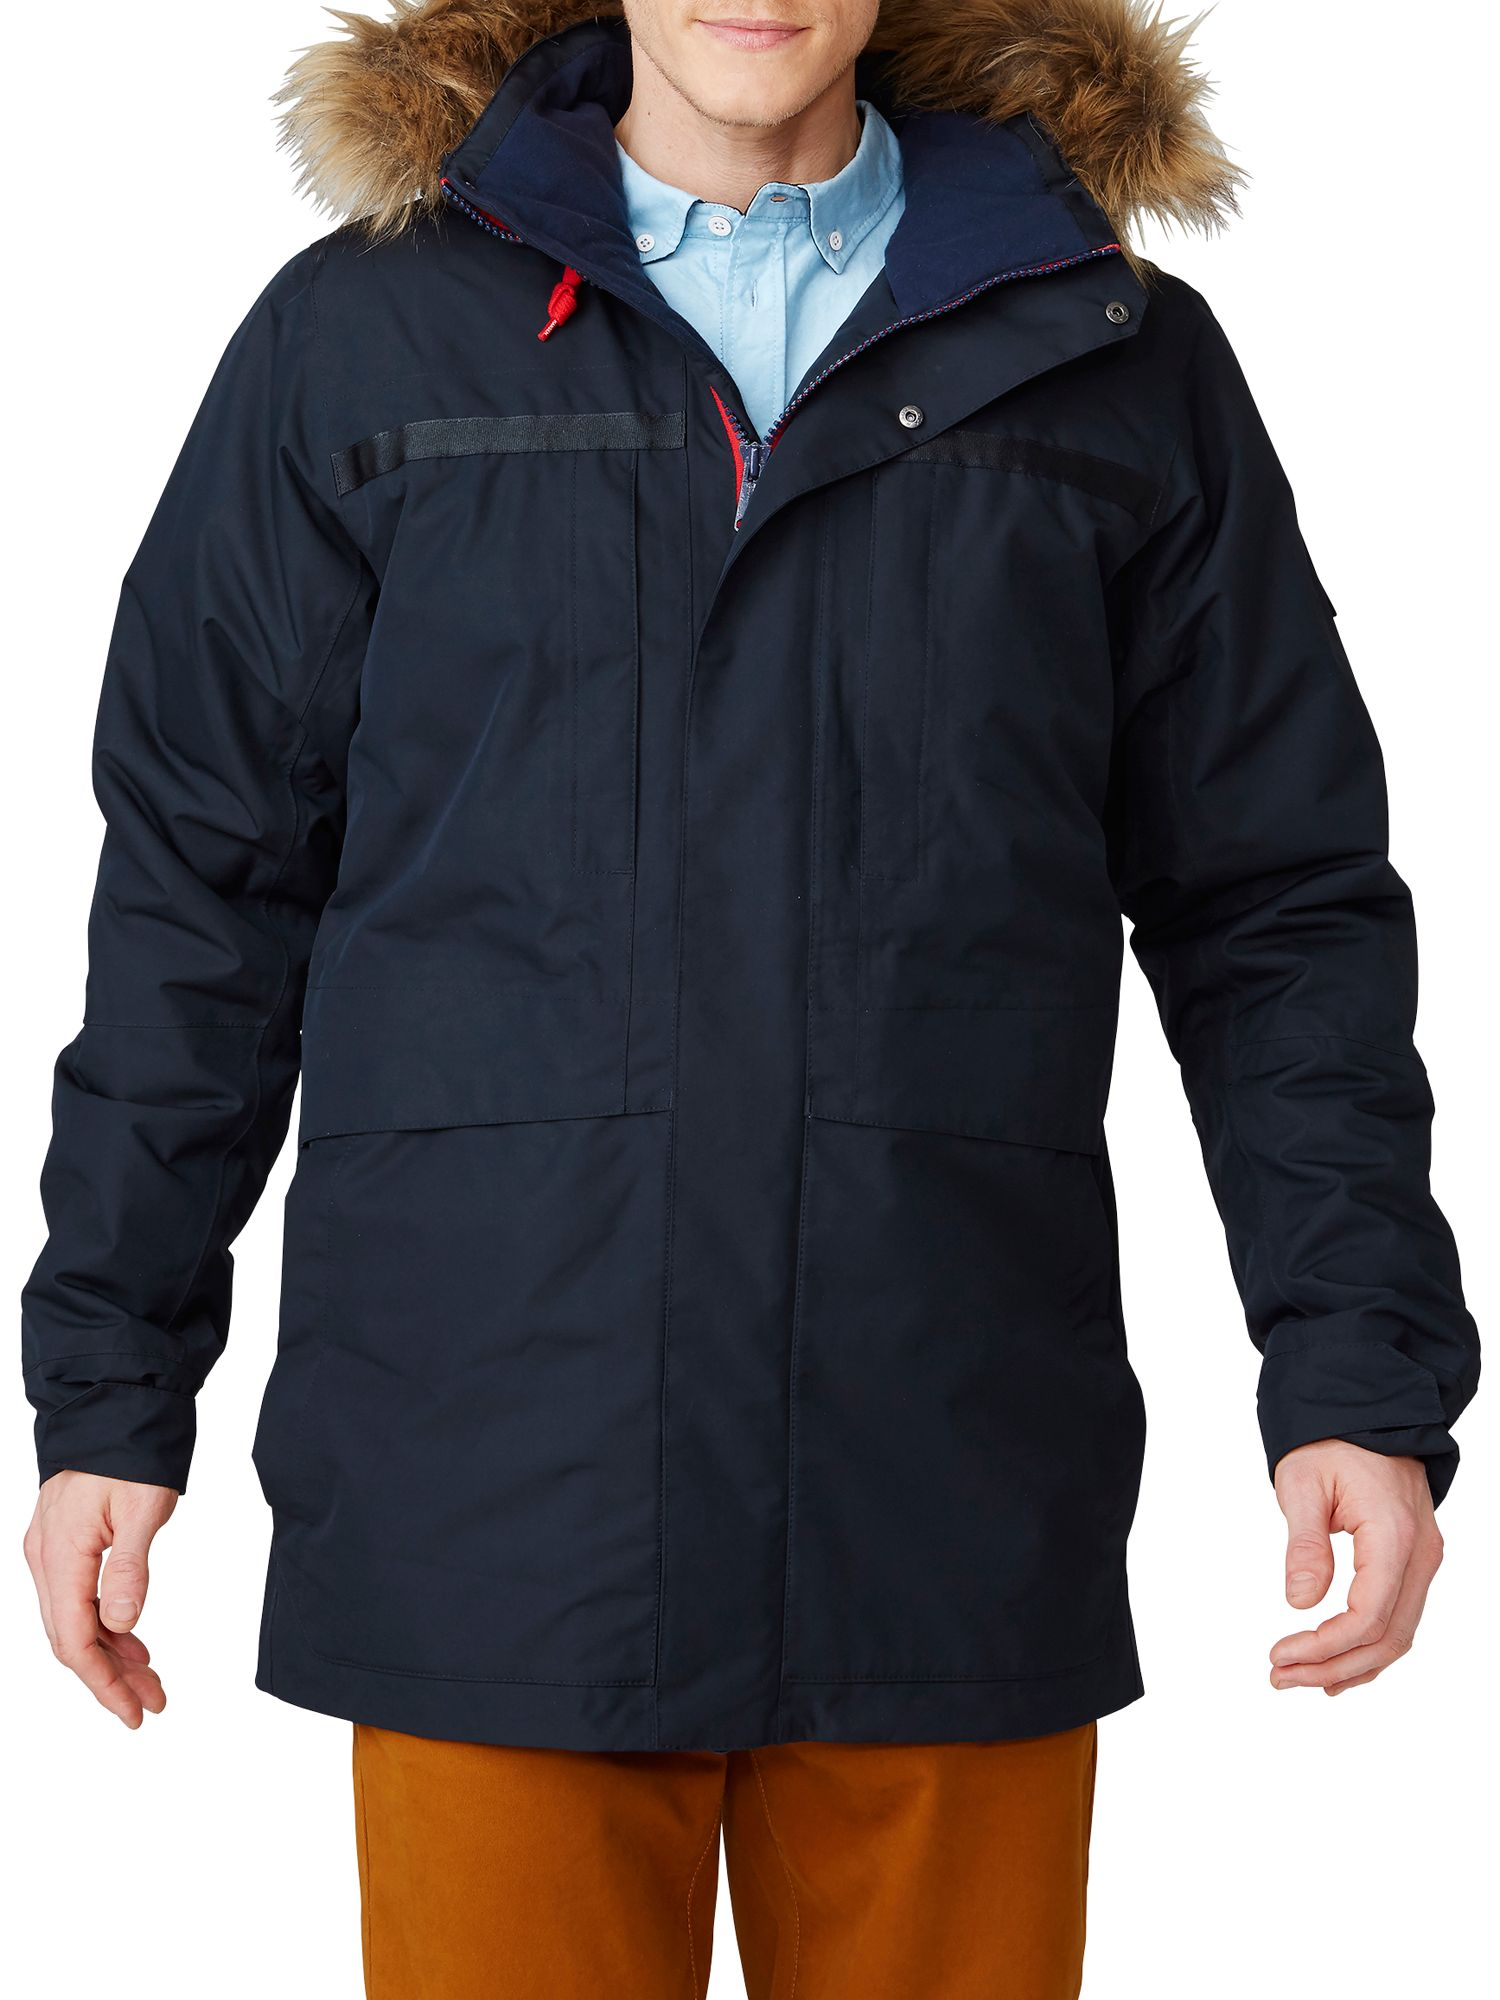 Helly Hansen Helly Hansen Coastal 2 Waterproof Men's Parka Jacket, Navy